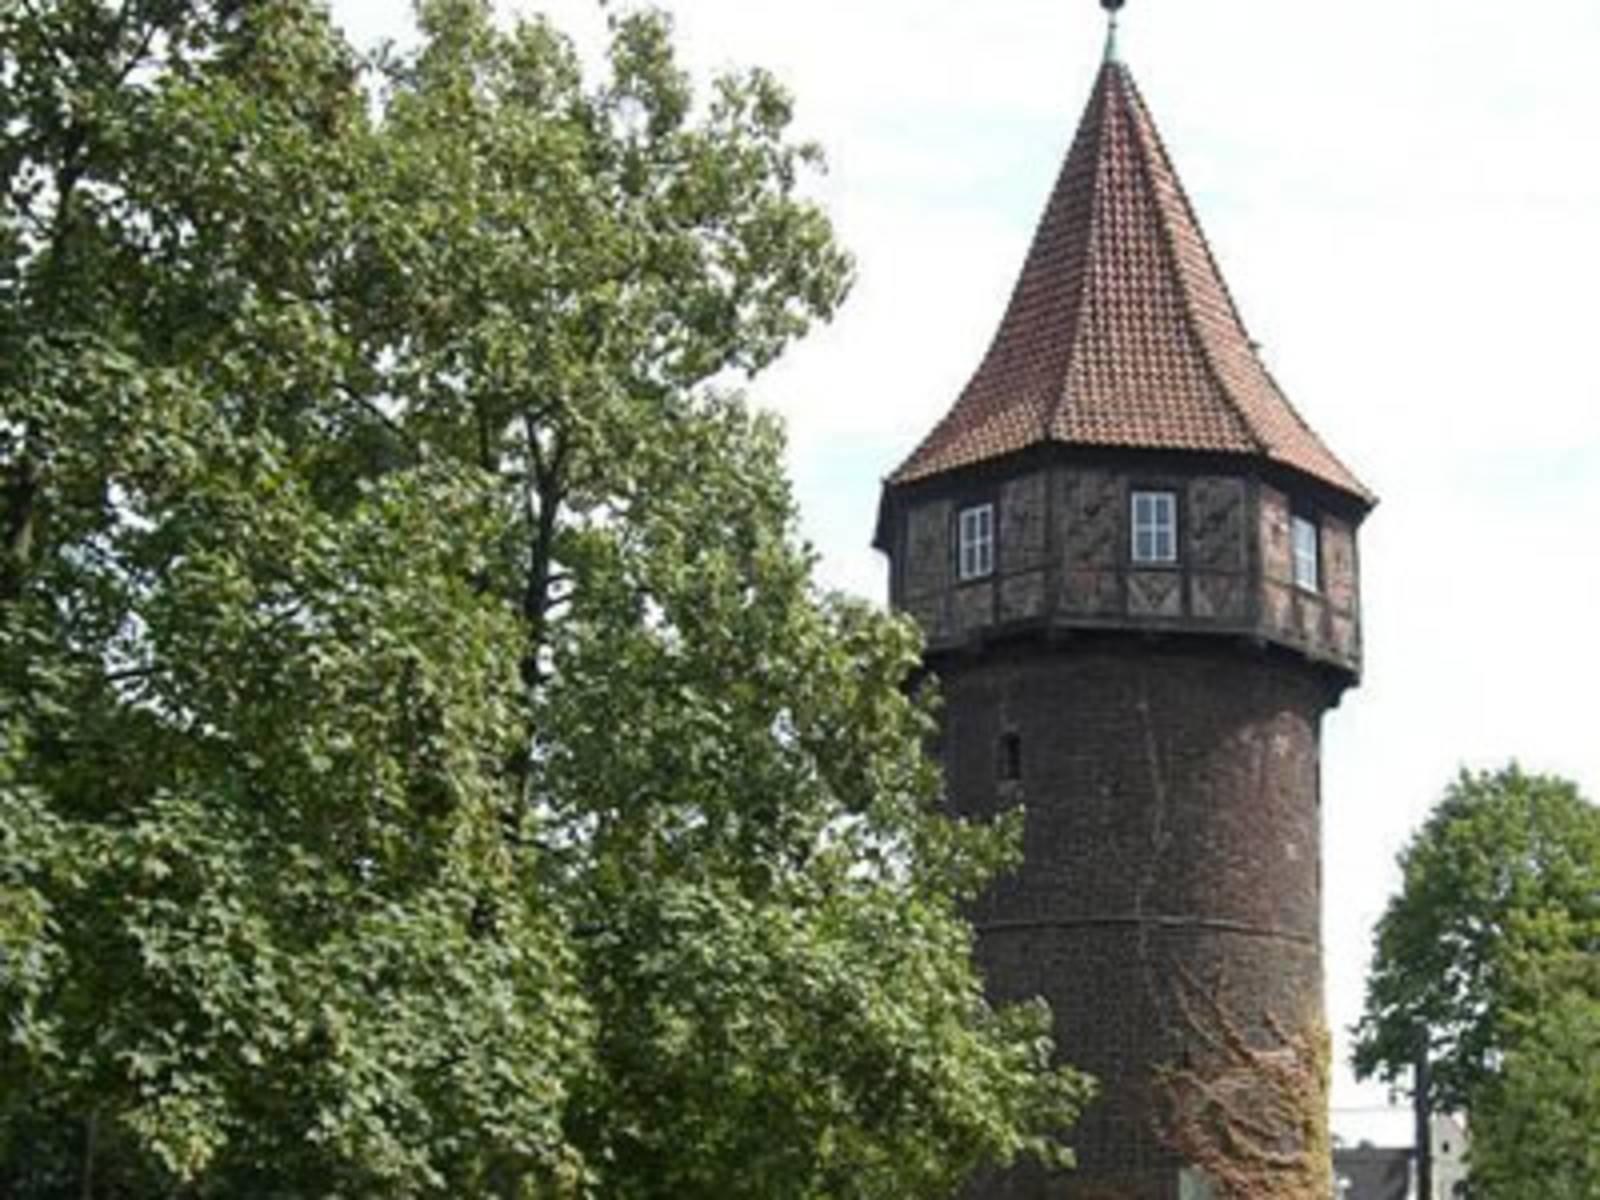 Foto vom Döhrener Turm in der Südstadt